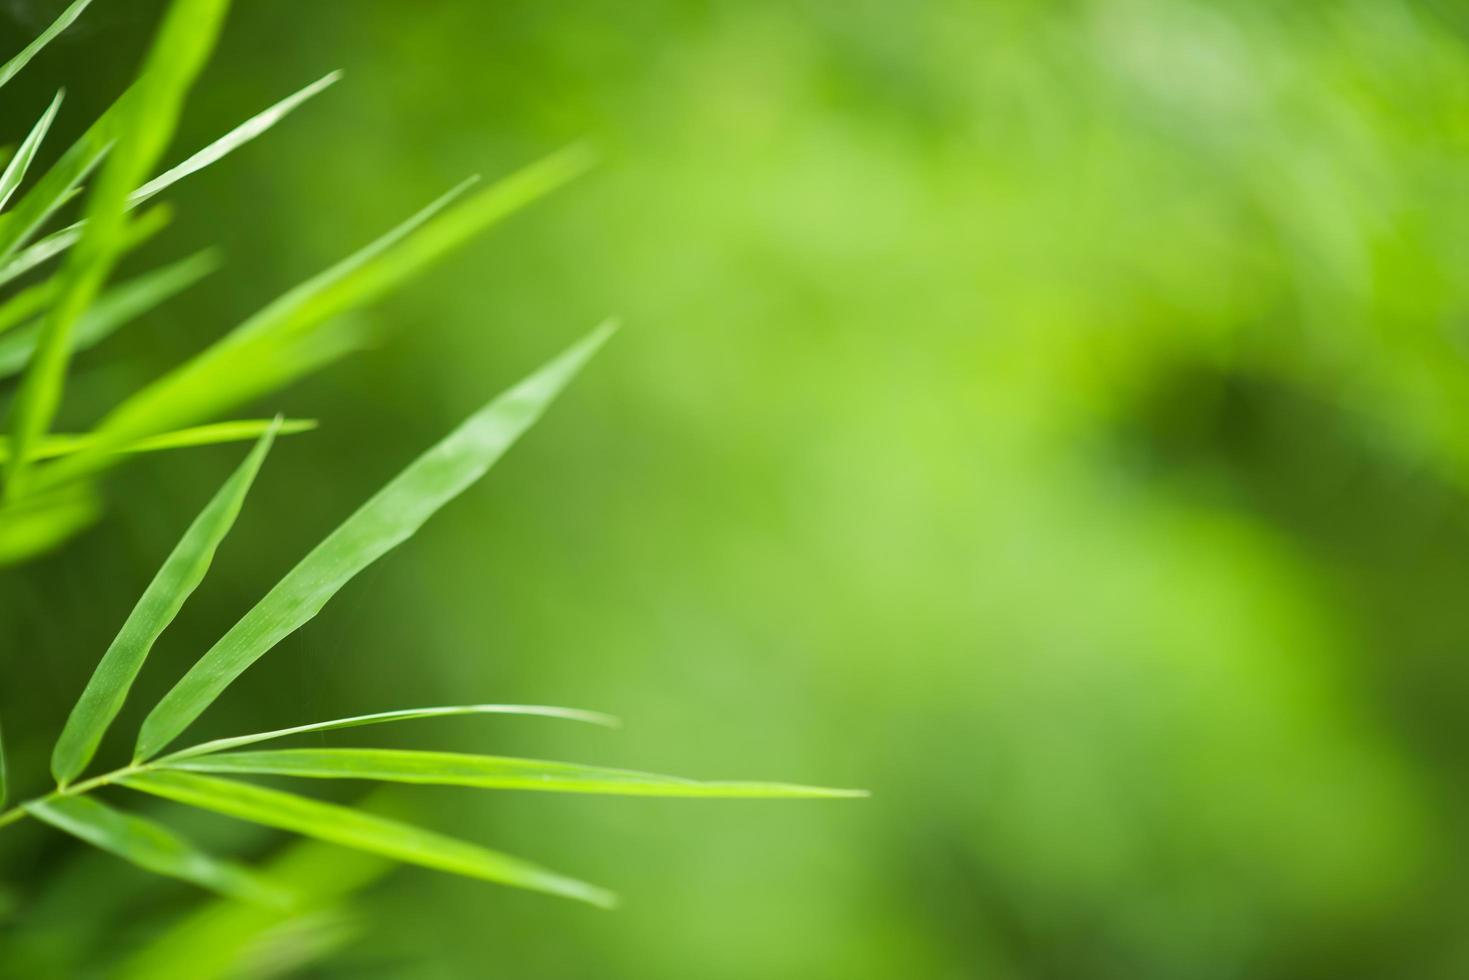 groene bamboe achtergrond foto